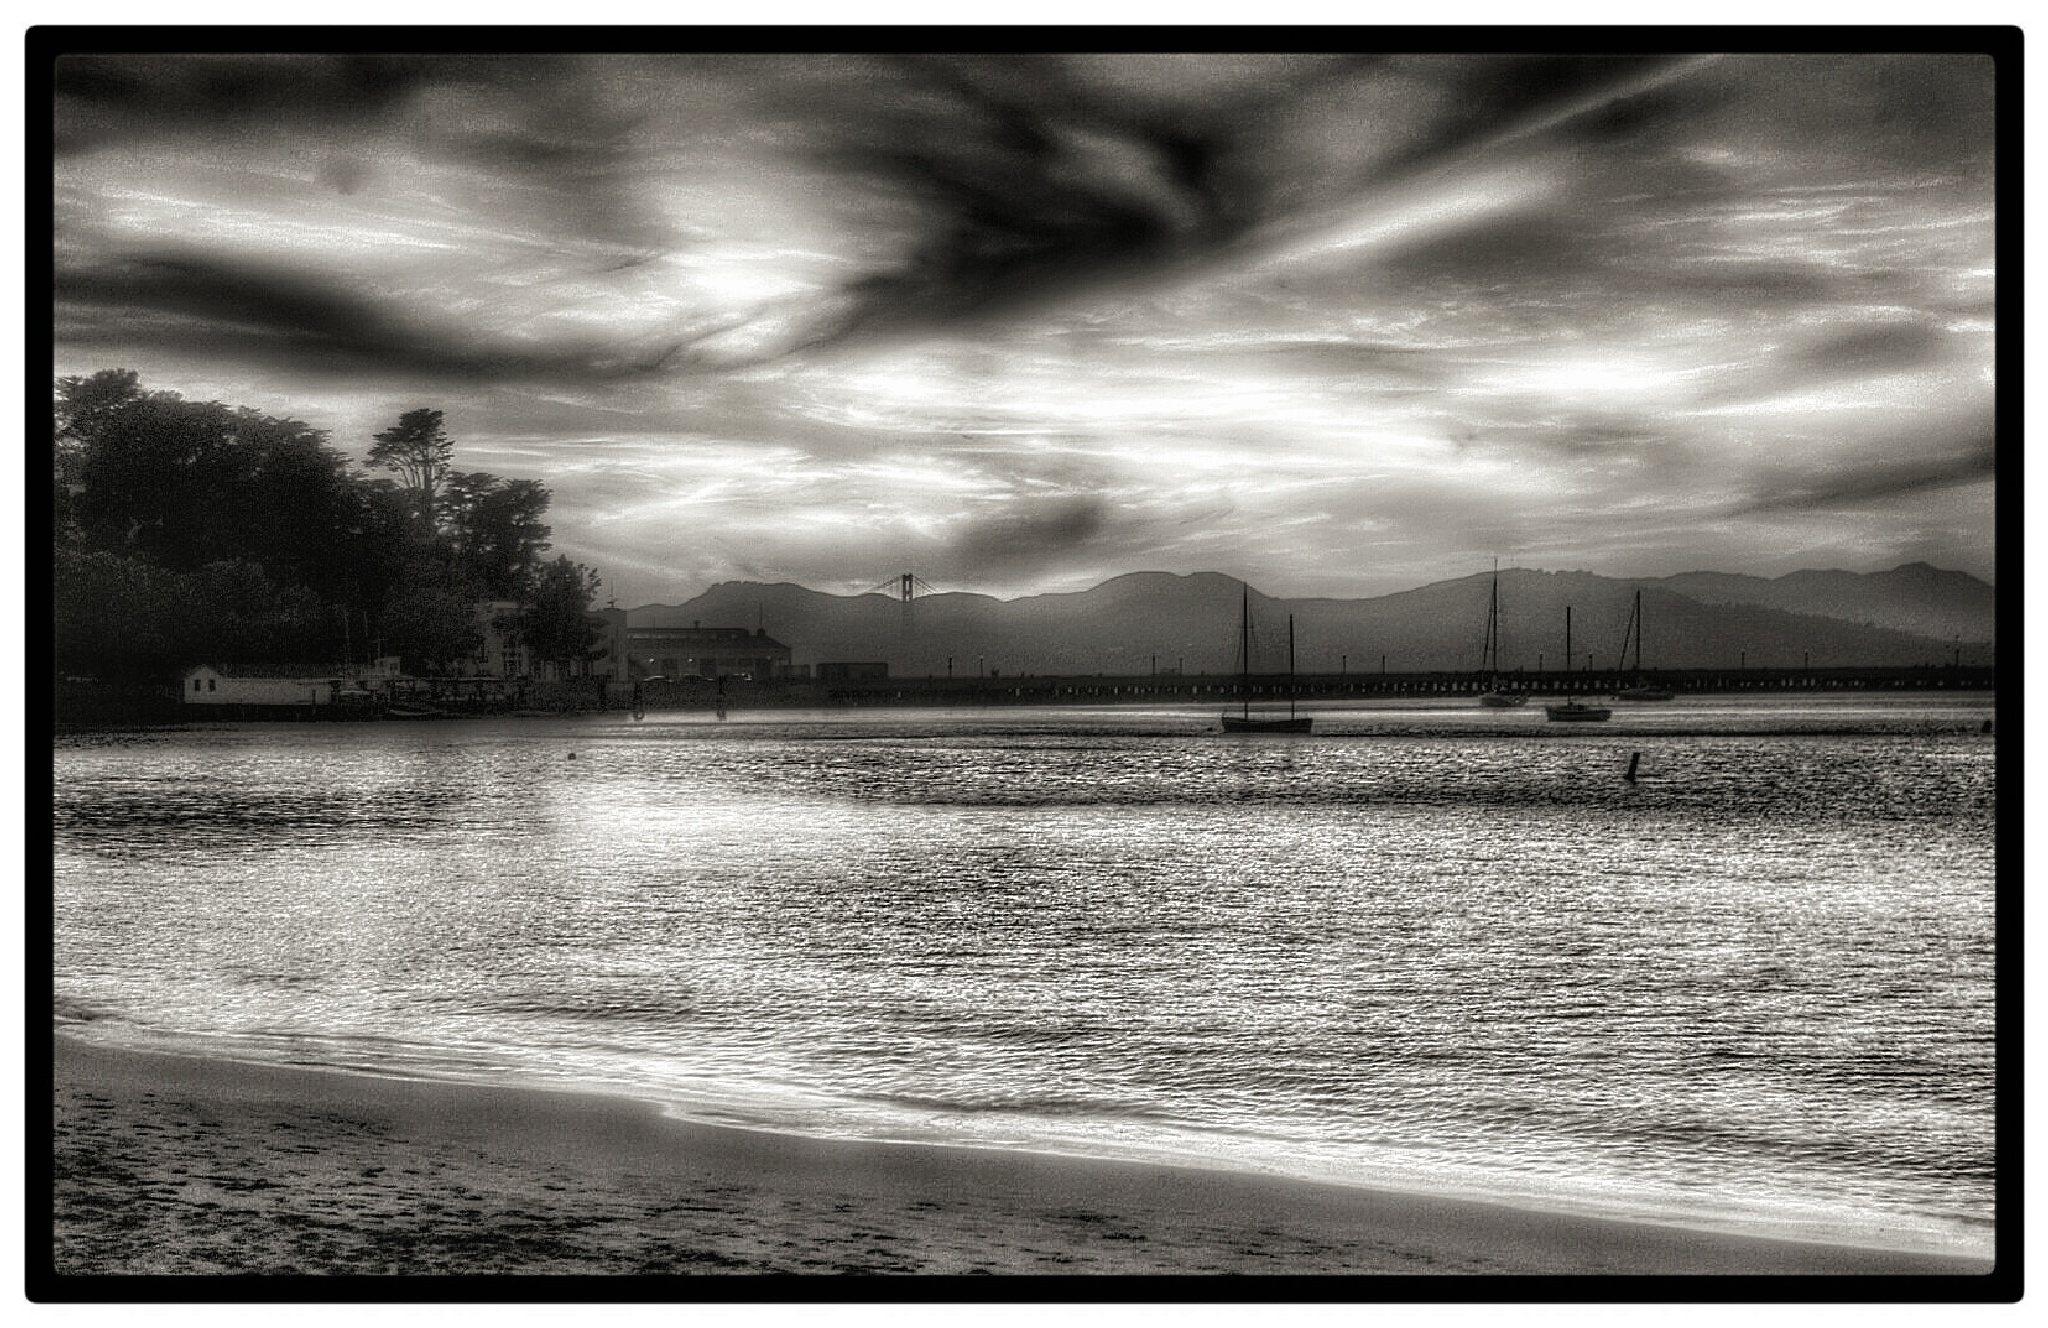 San Francisco Bay in B&W by Ming_Bear